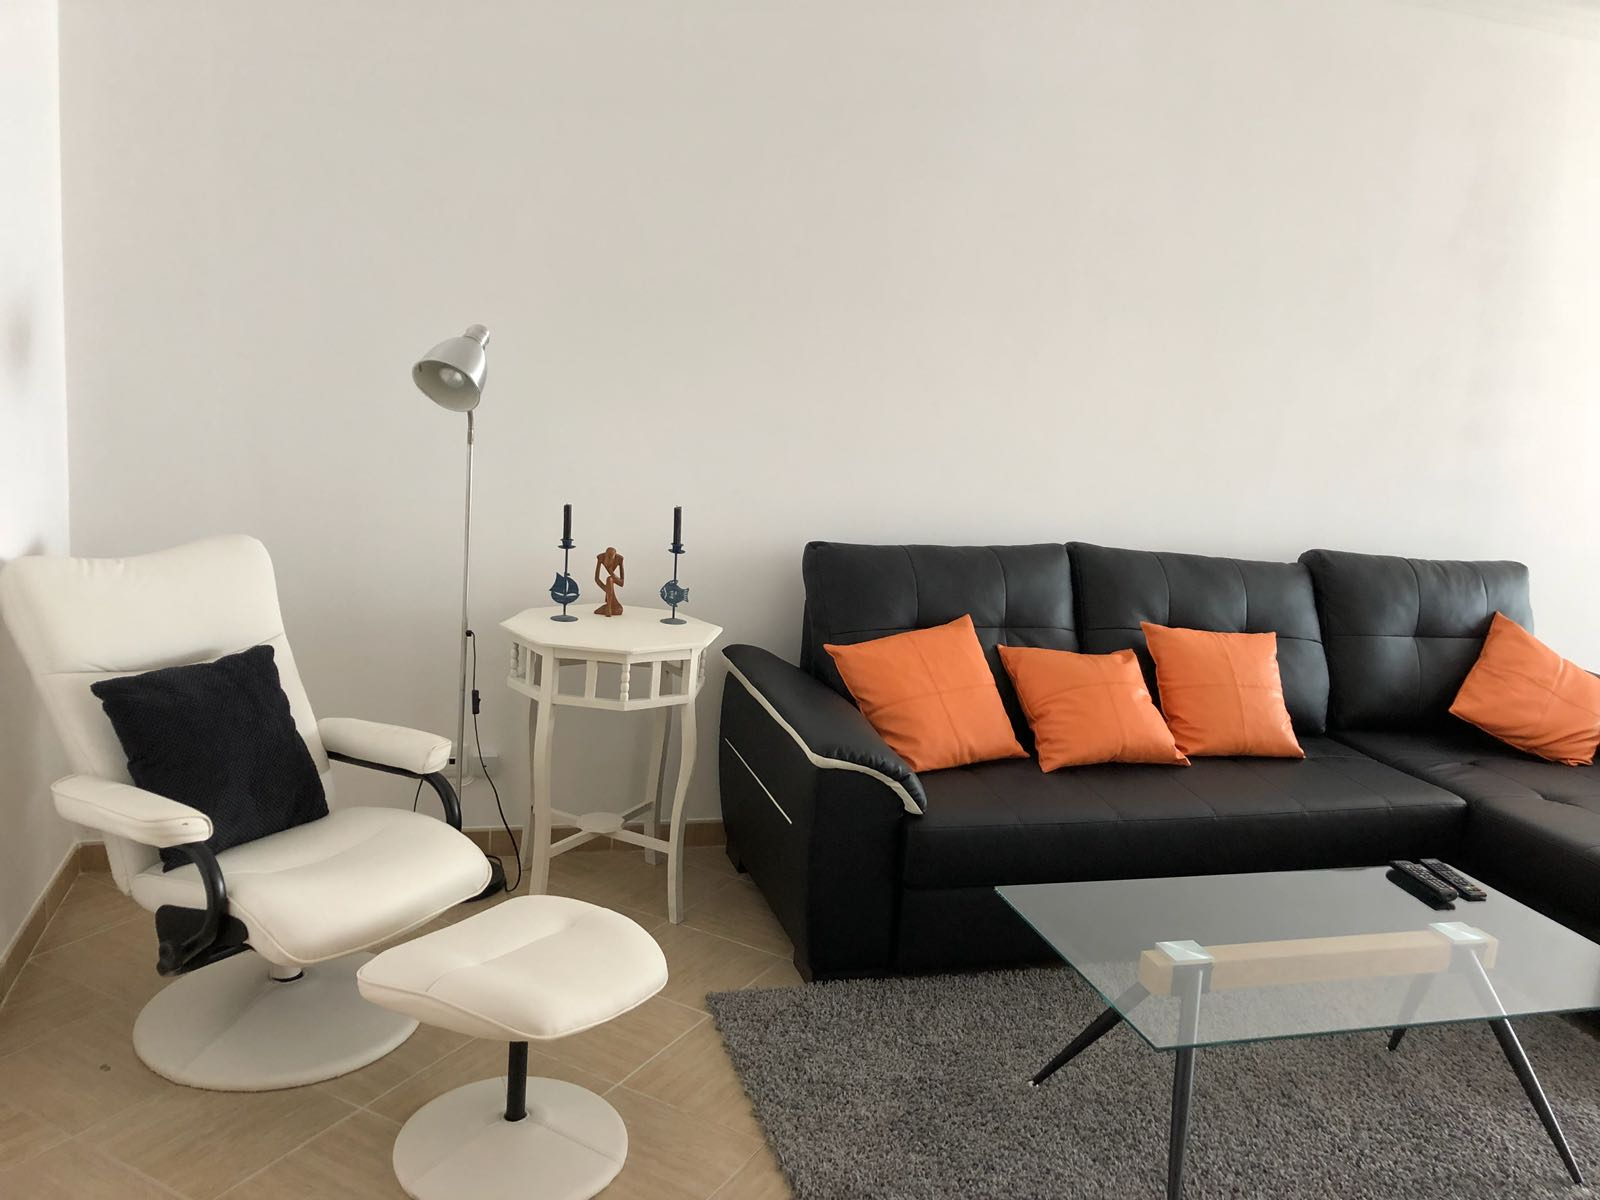 Holiday apartments and villas for rent, Apartamento T1 - Albufeira - Piscina e Garagem in Albufeira, Portugal Algarve, REF_IMG_6128_6138